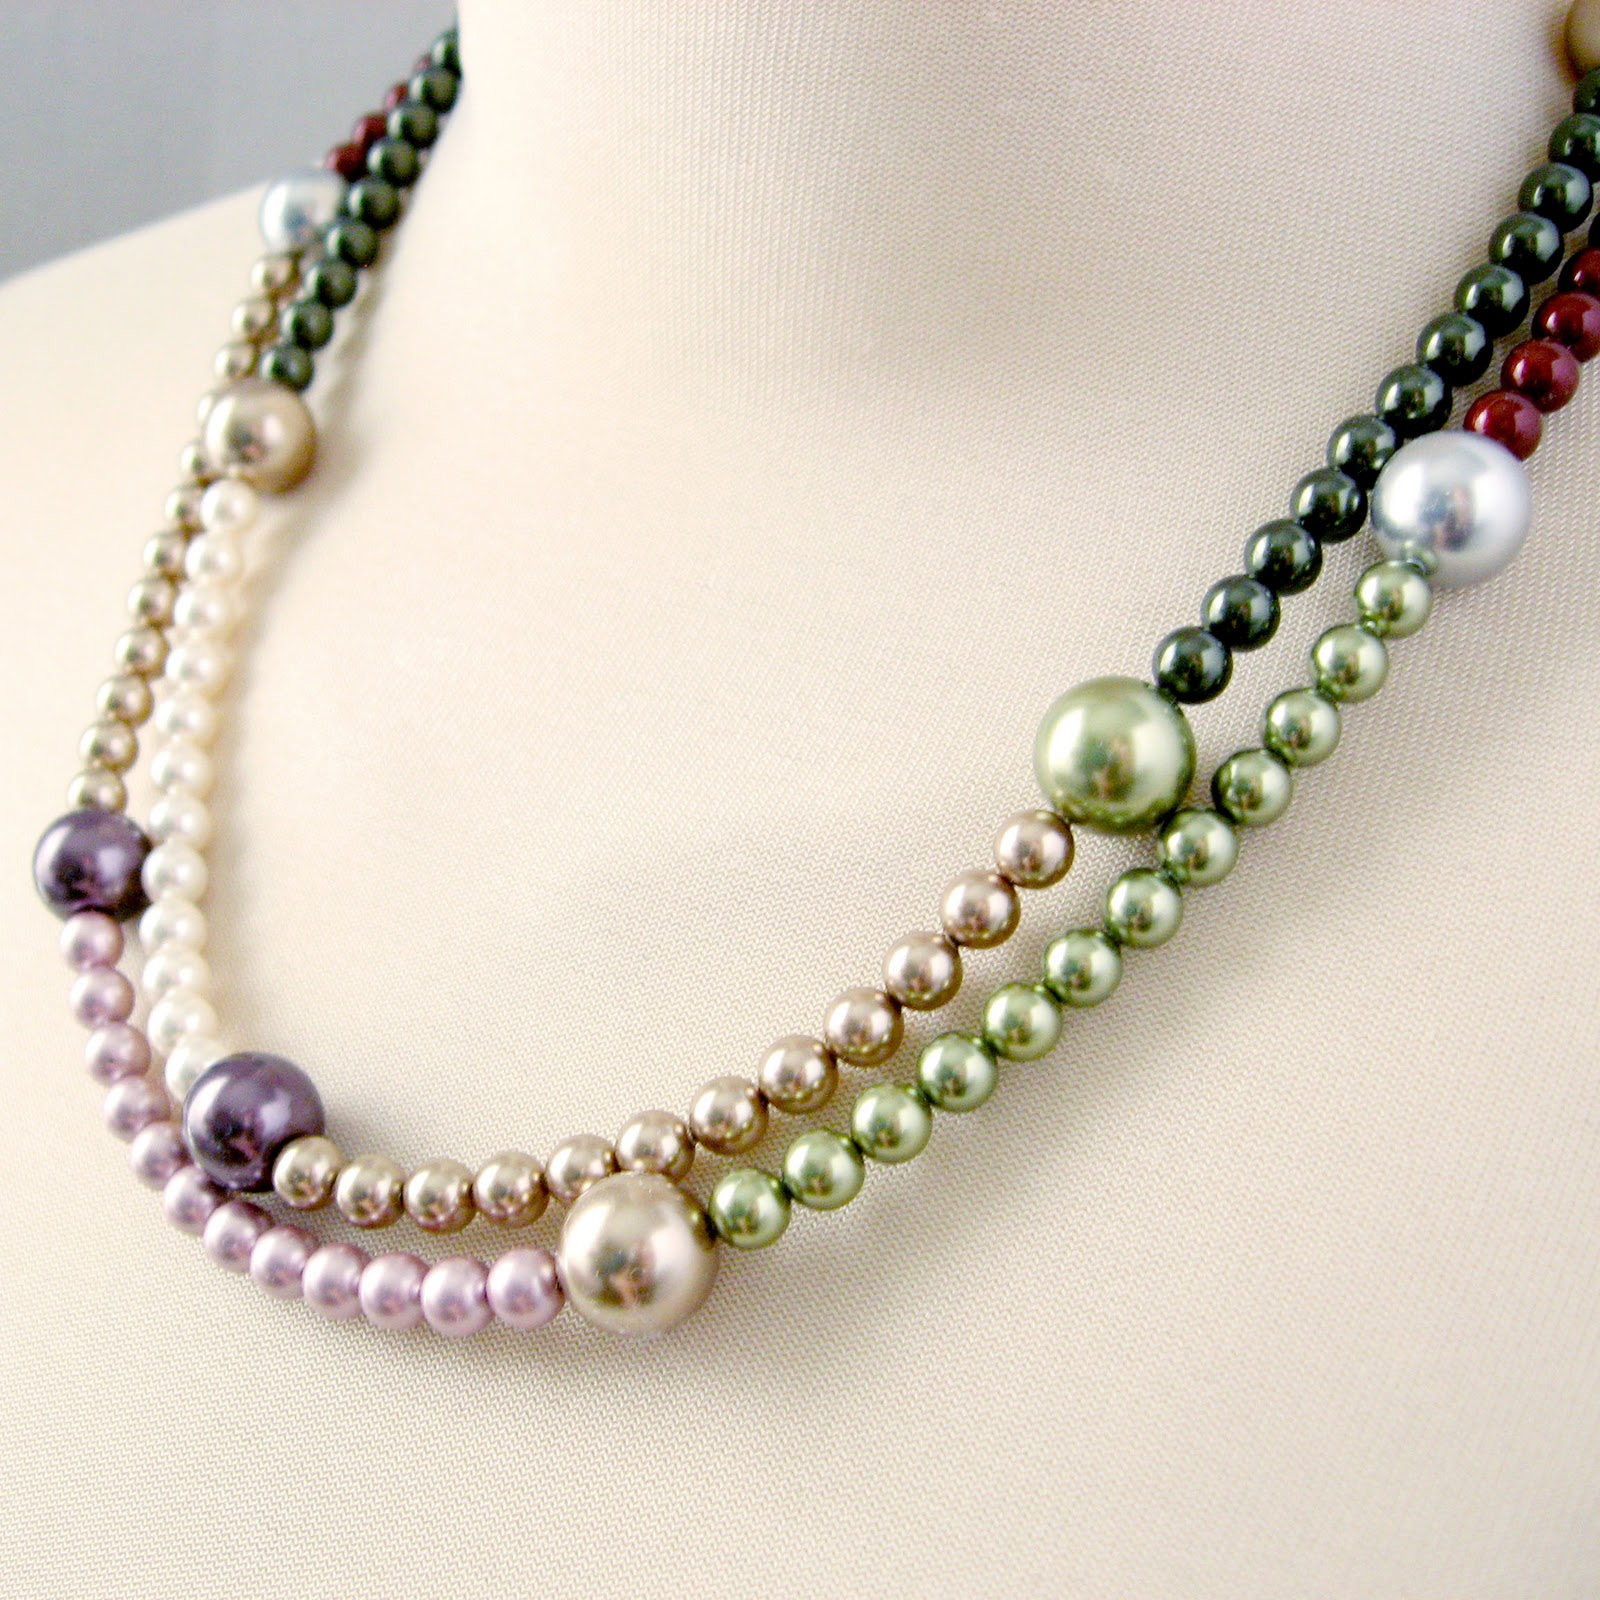 GalleriaLinda Showcase Contemporary Pearl Designs Popular